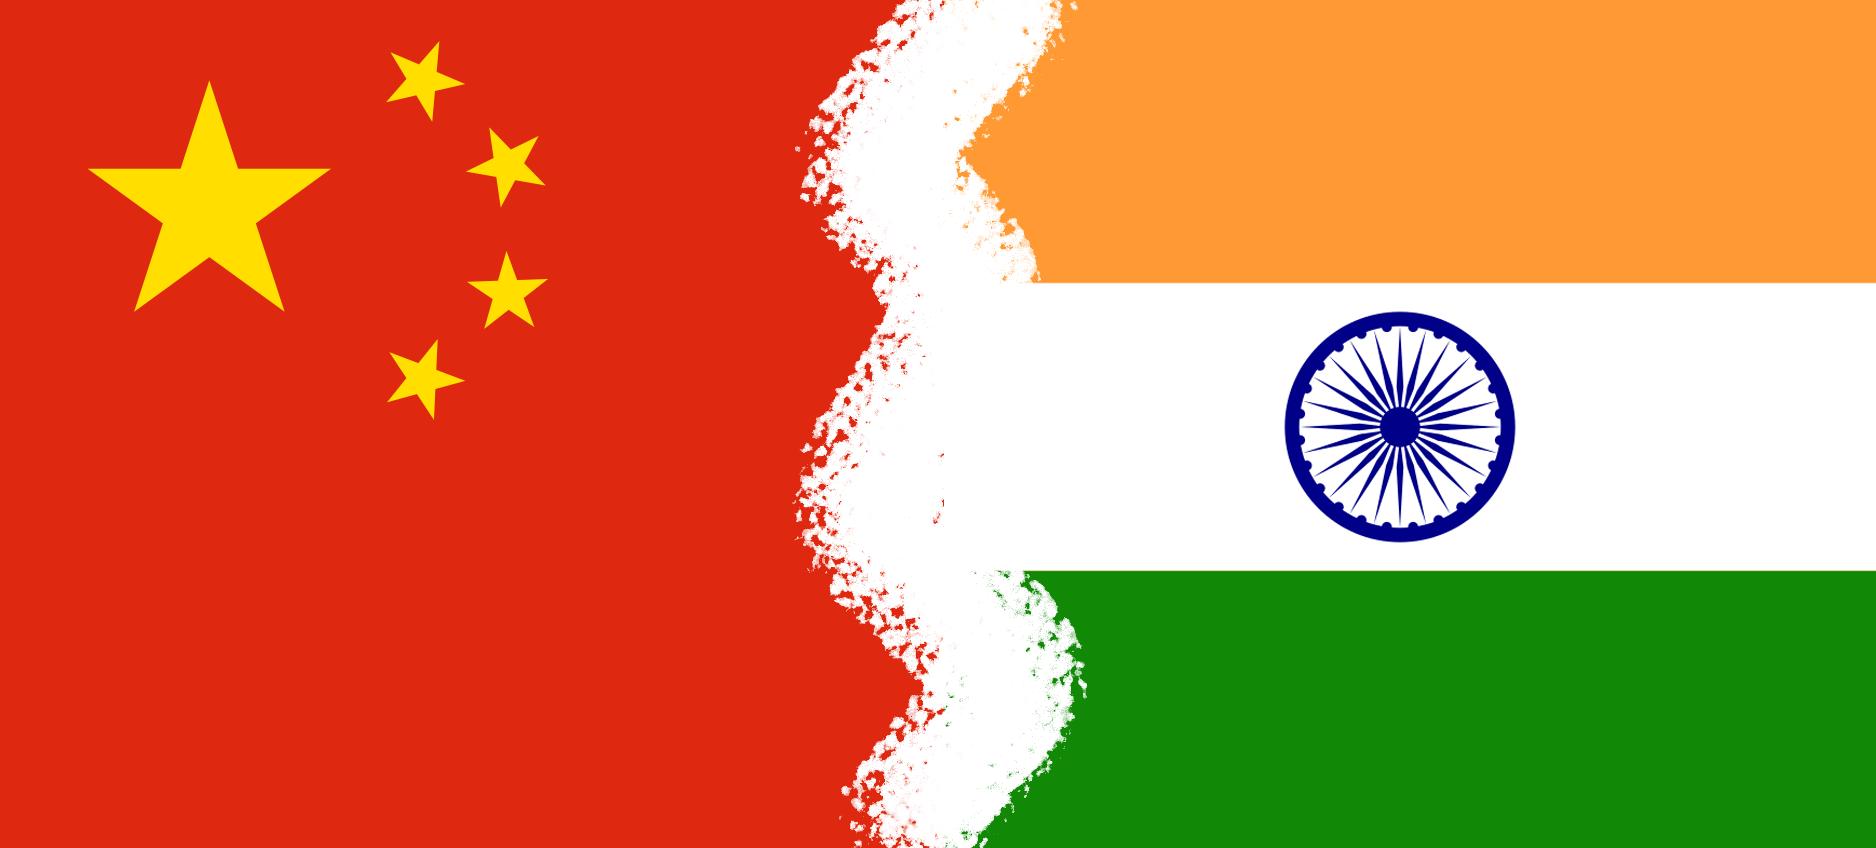 File:China-india.png - Wikimedia Commons